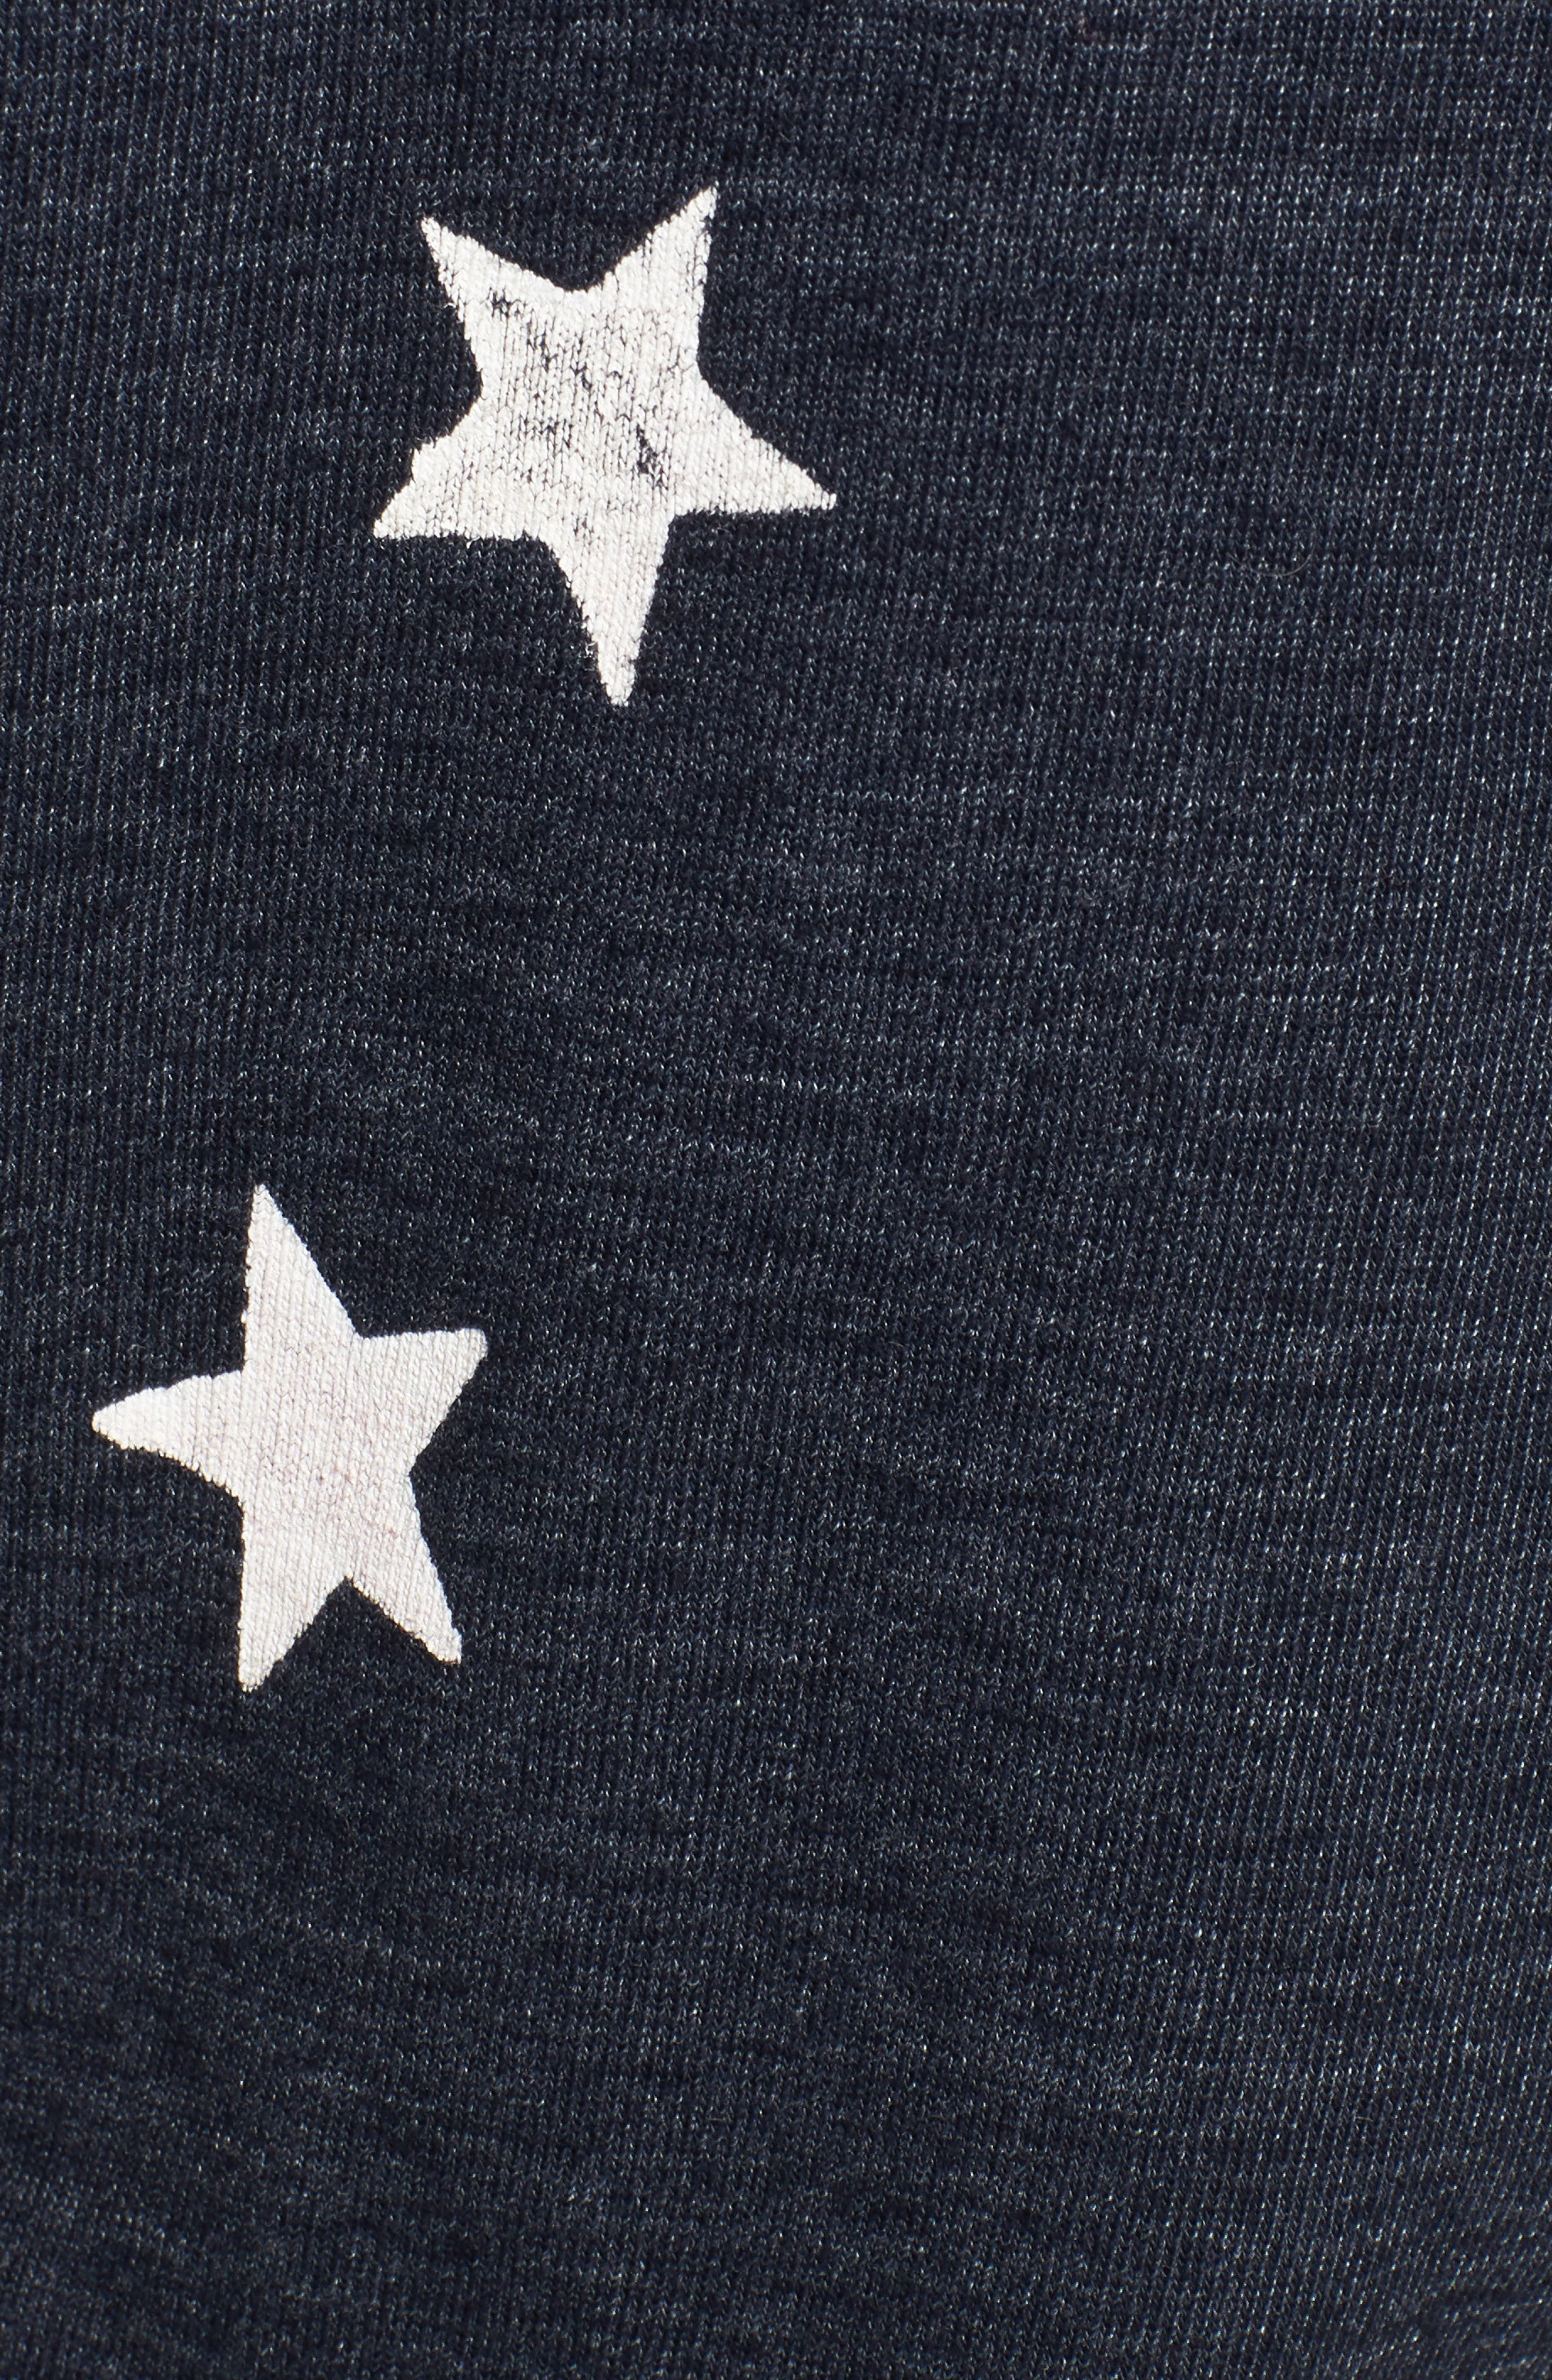 Star Zip-Up Hoodie,                             Alternate thumbnail 5, color,                             NAVY/ WHITE